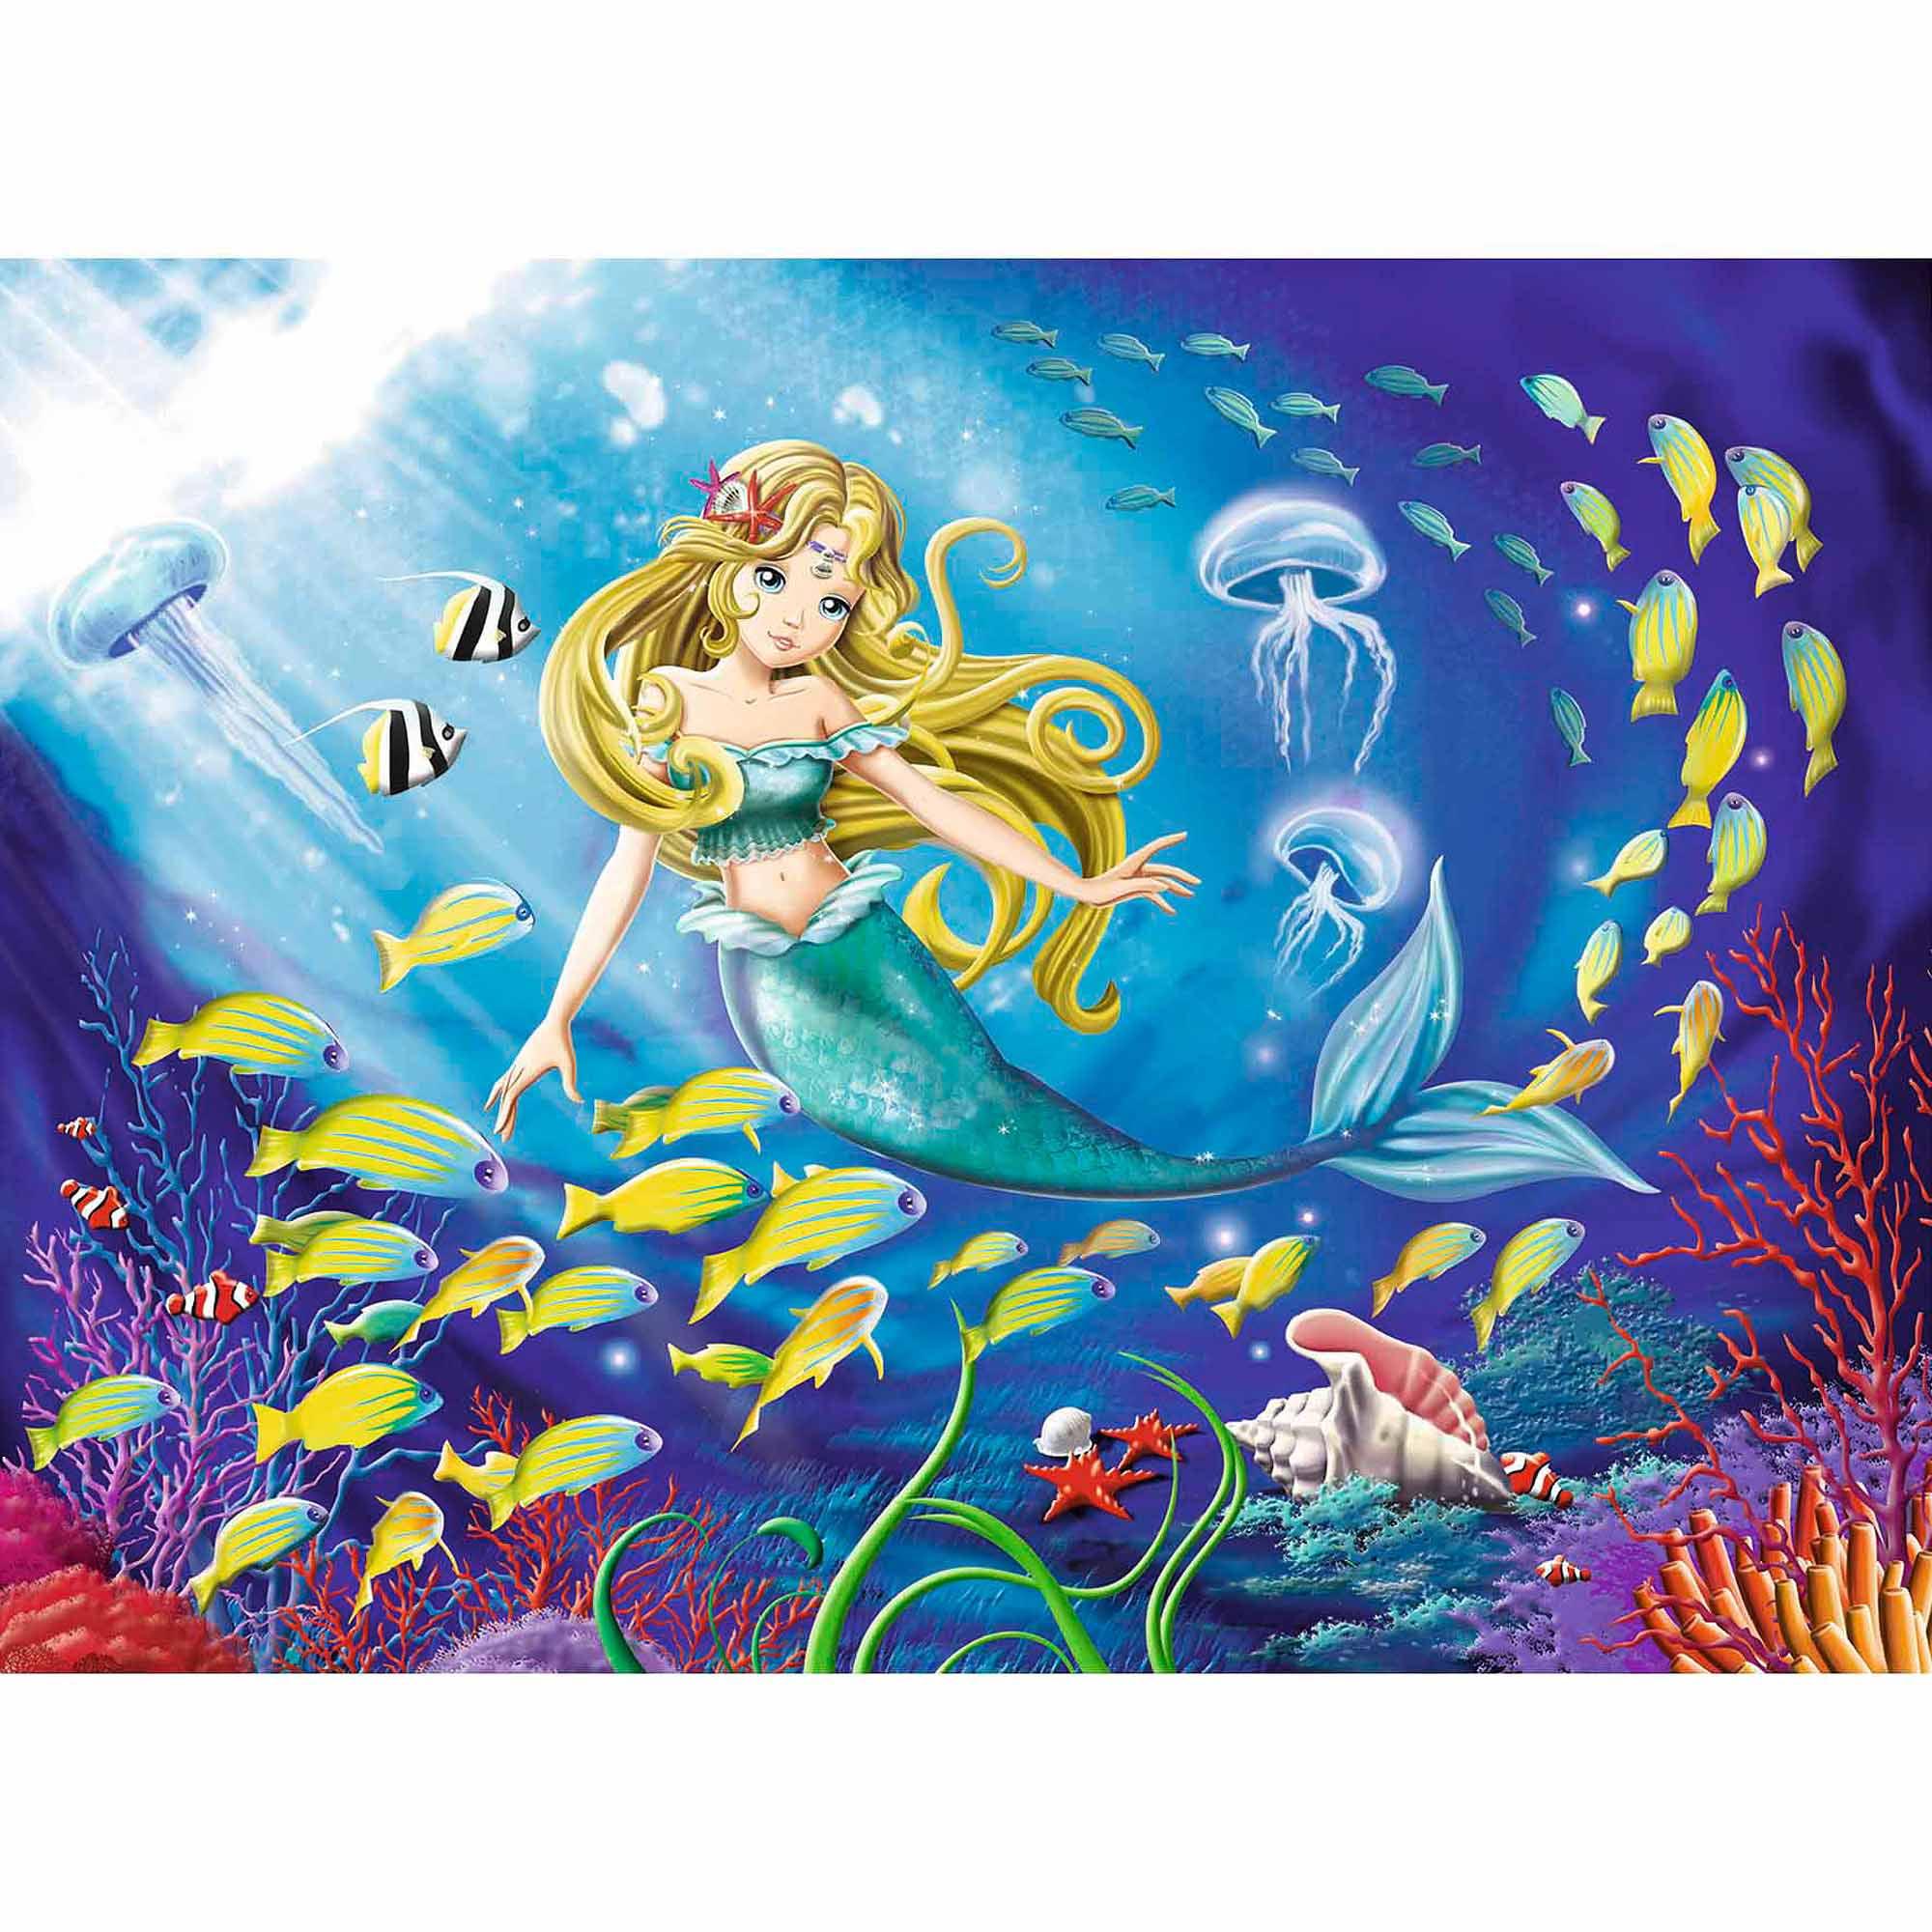 Little Mermaid Puzzle, 100 Pieces by Ravensburger